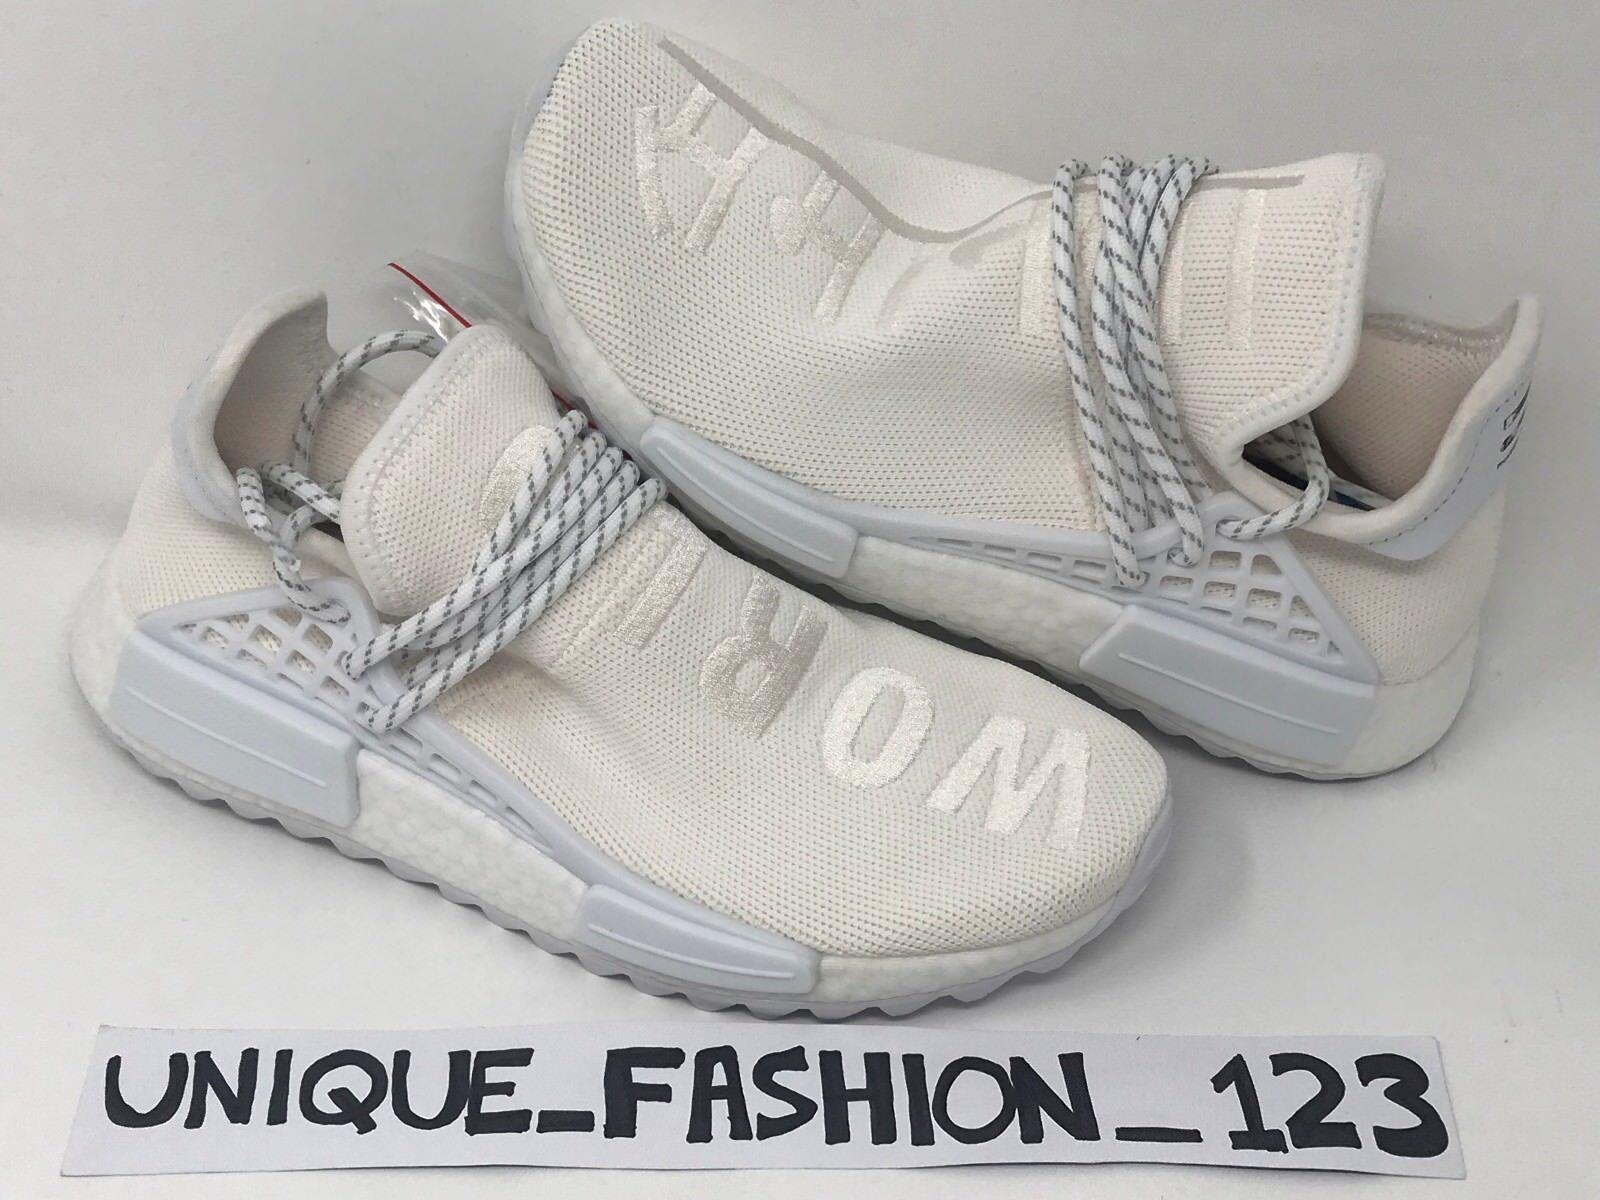 Adidas NMD raza humana x Pharrell Hu PW 6 7 Holi 8 9 10 Trail Holi 7 lienzo en blanco blanco 85411c